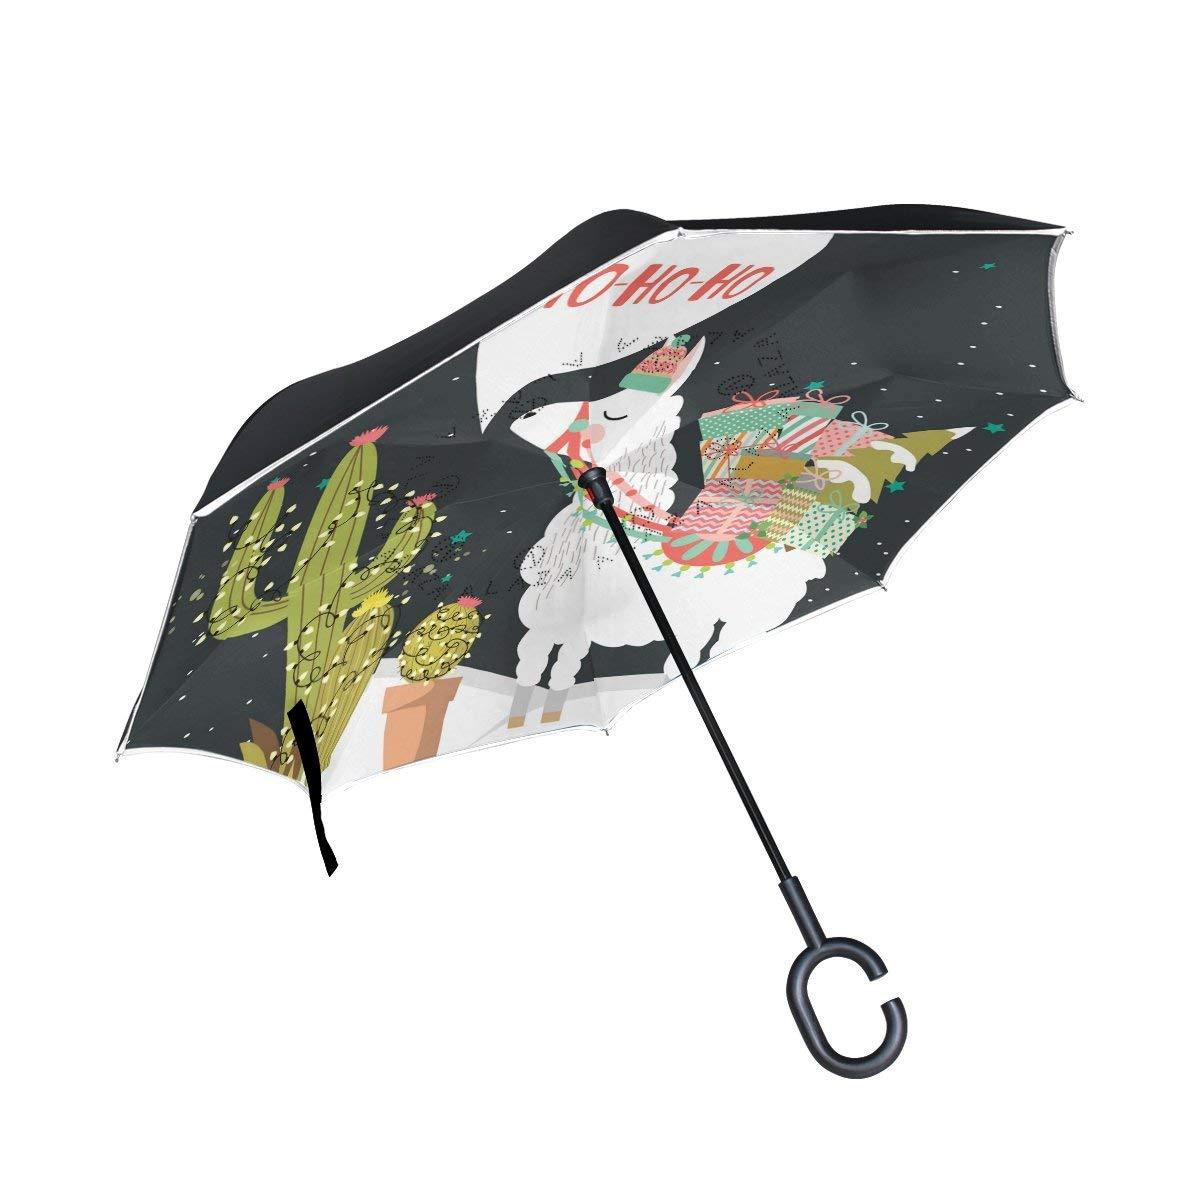 Llama Cartoon Alpaca Double Layer Windproof UV Protection Reverse Umbrella With C-Shaped Handle Upside-Down Inverted Umbrella For Car Rain Outdoor